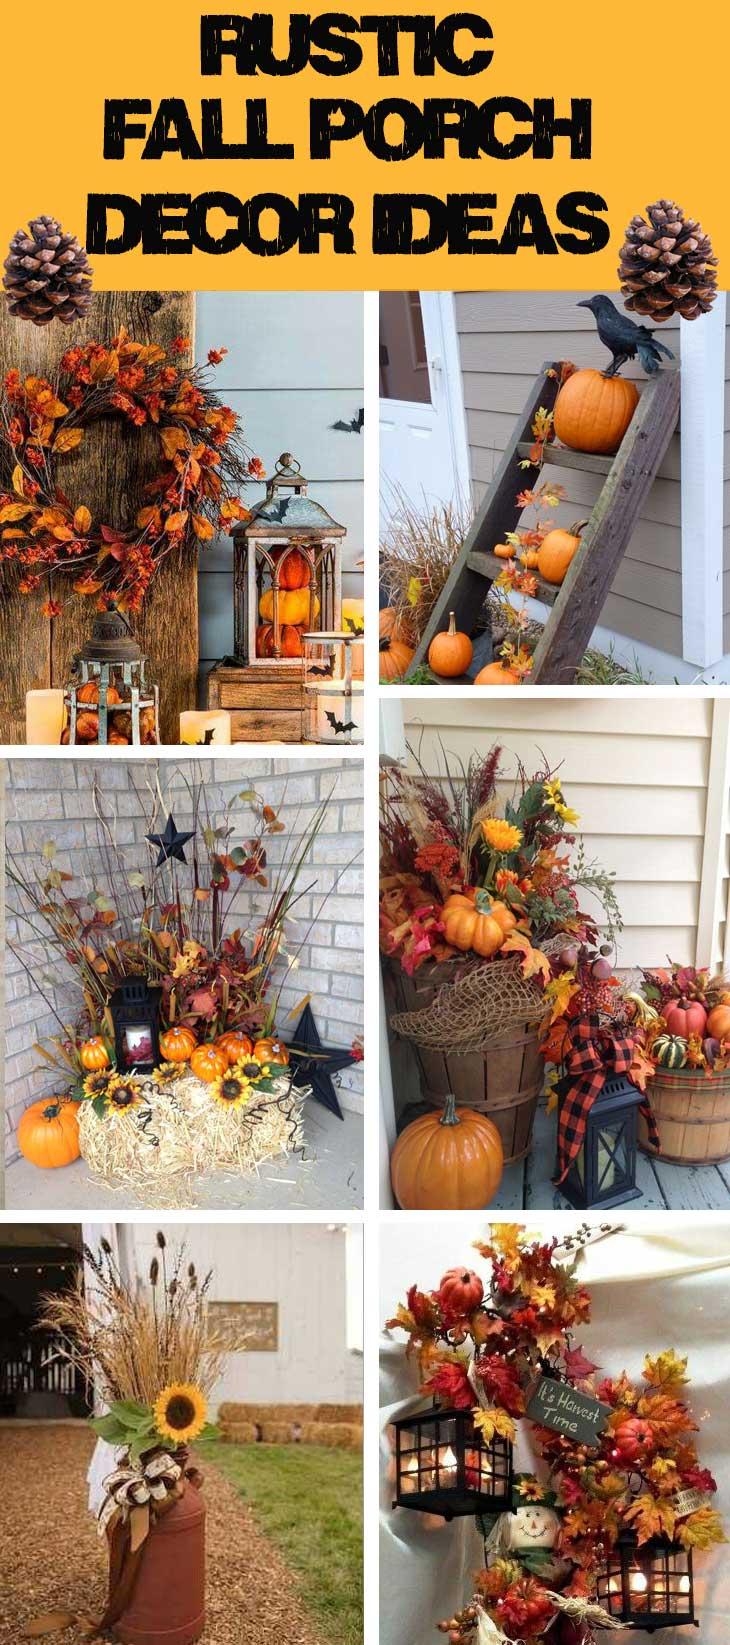 Rustic Fall Porch Decor Ideas Diy Sweetheart